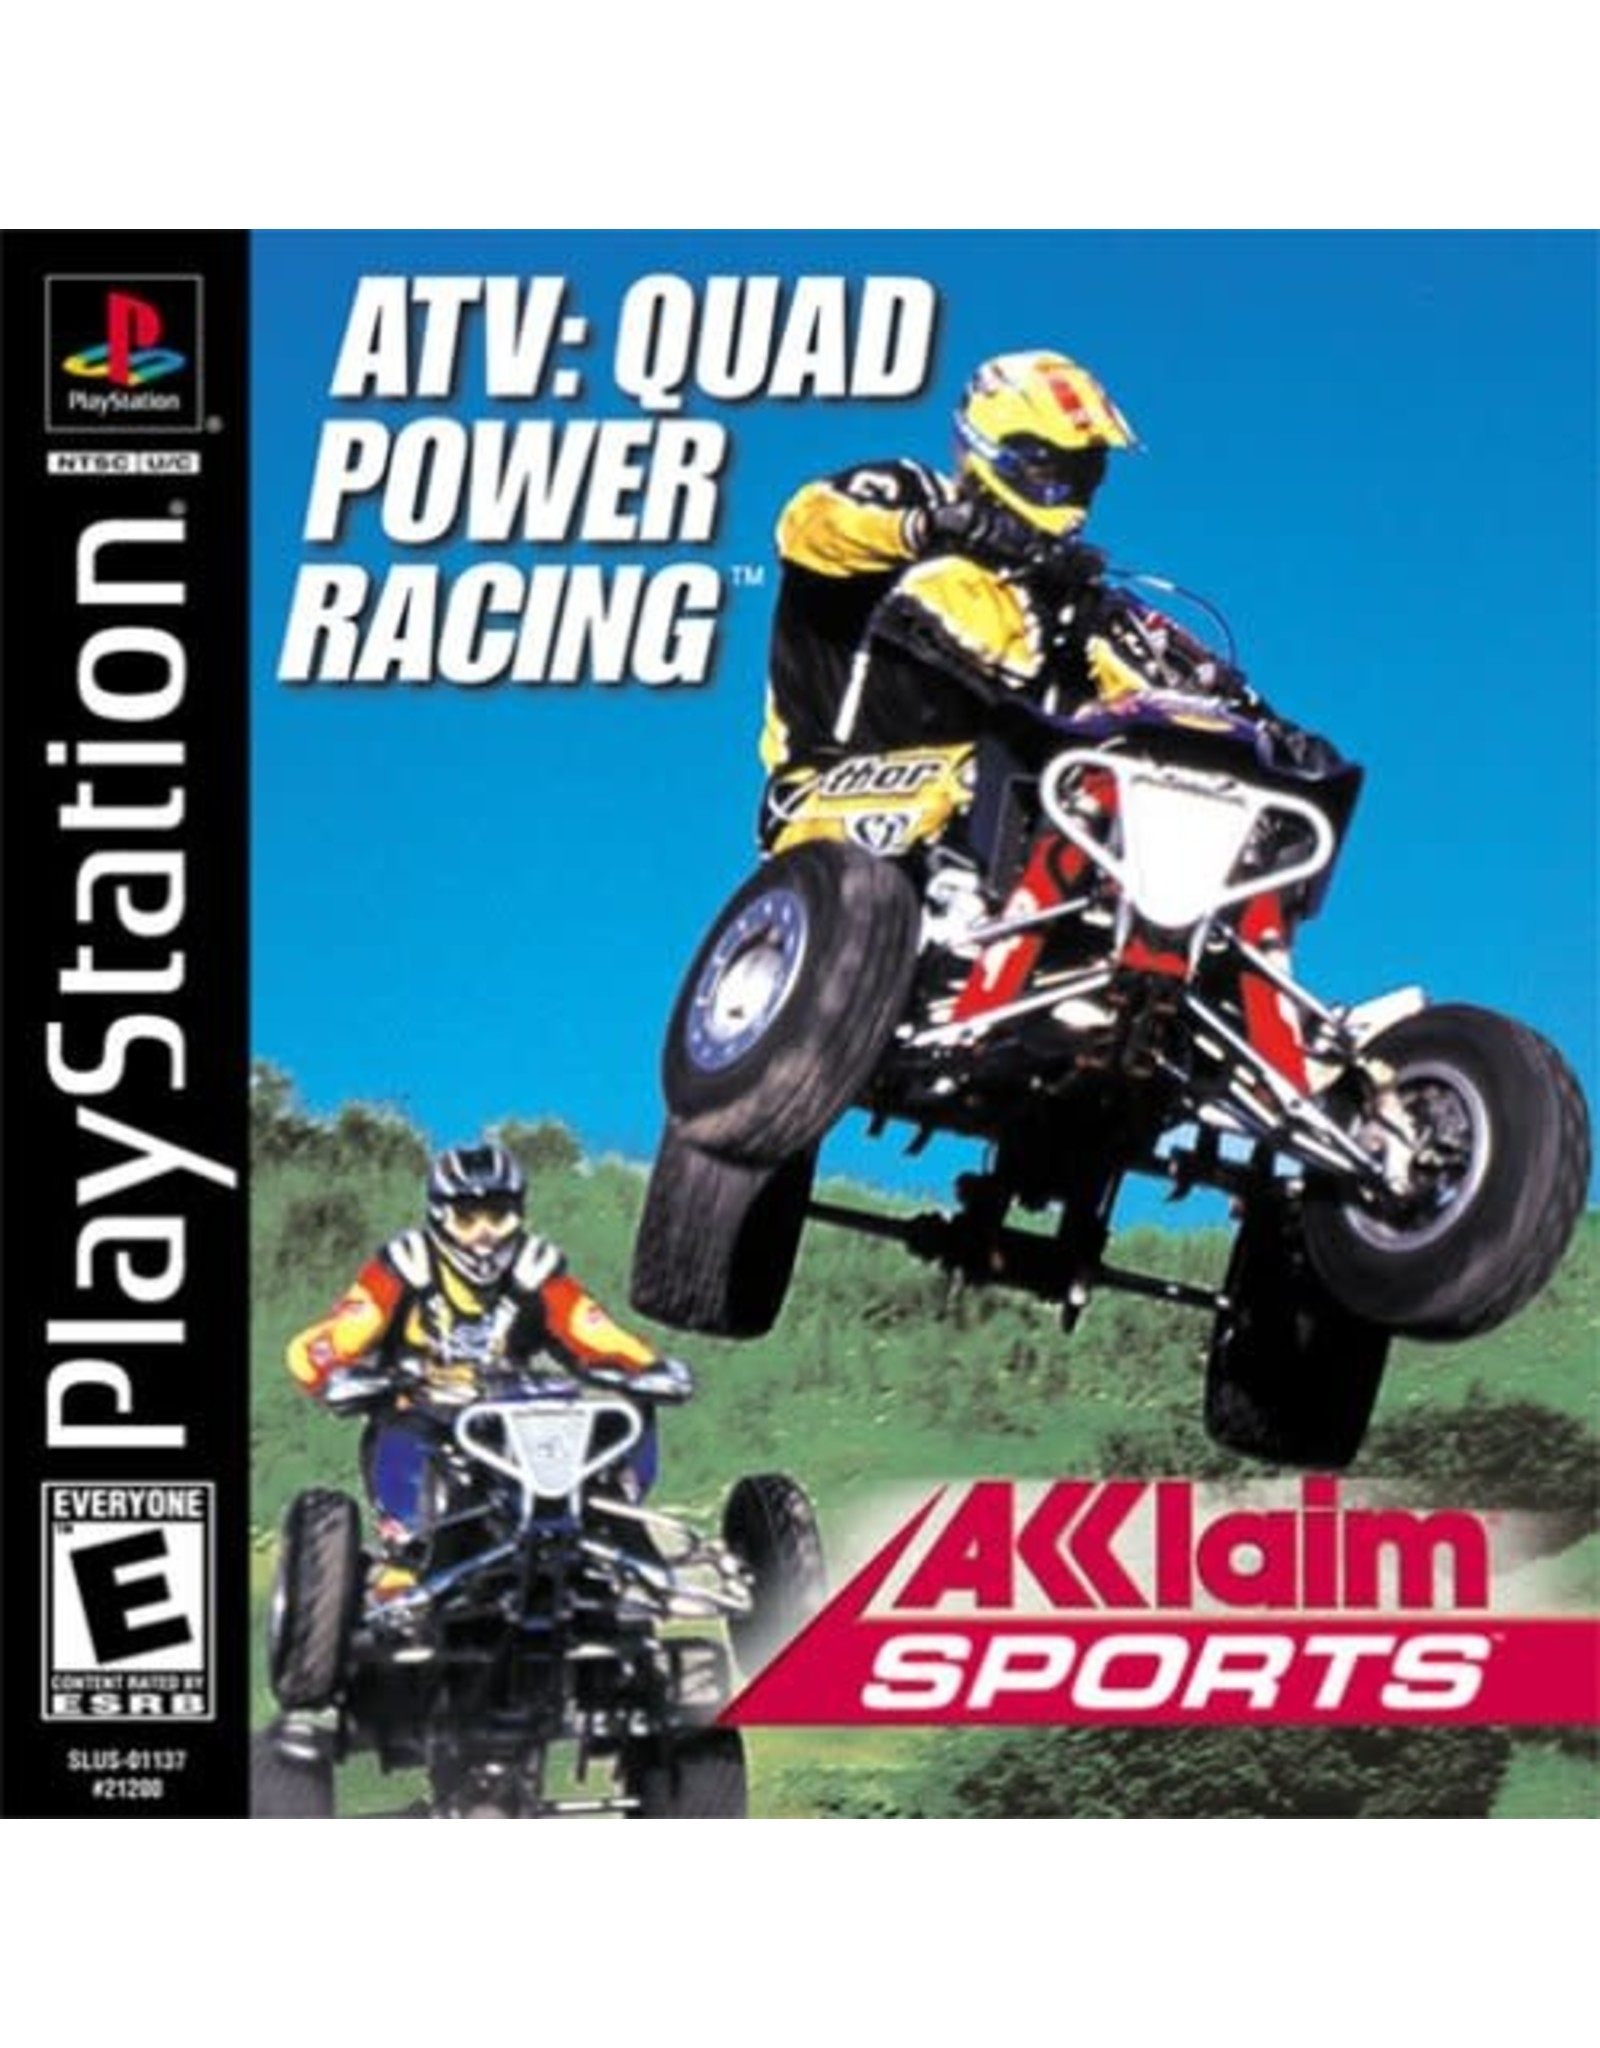 Playstation ATV Quad Power Racing (CiB)